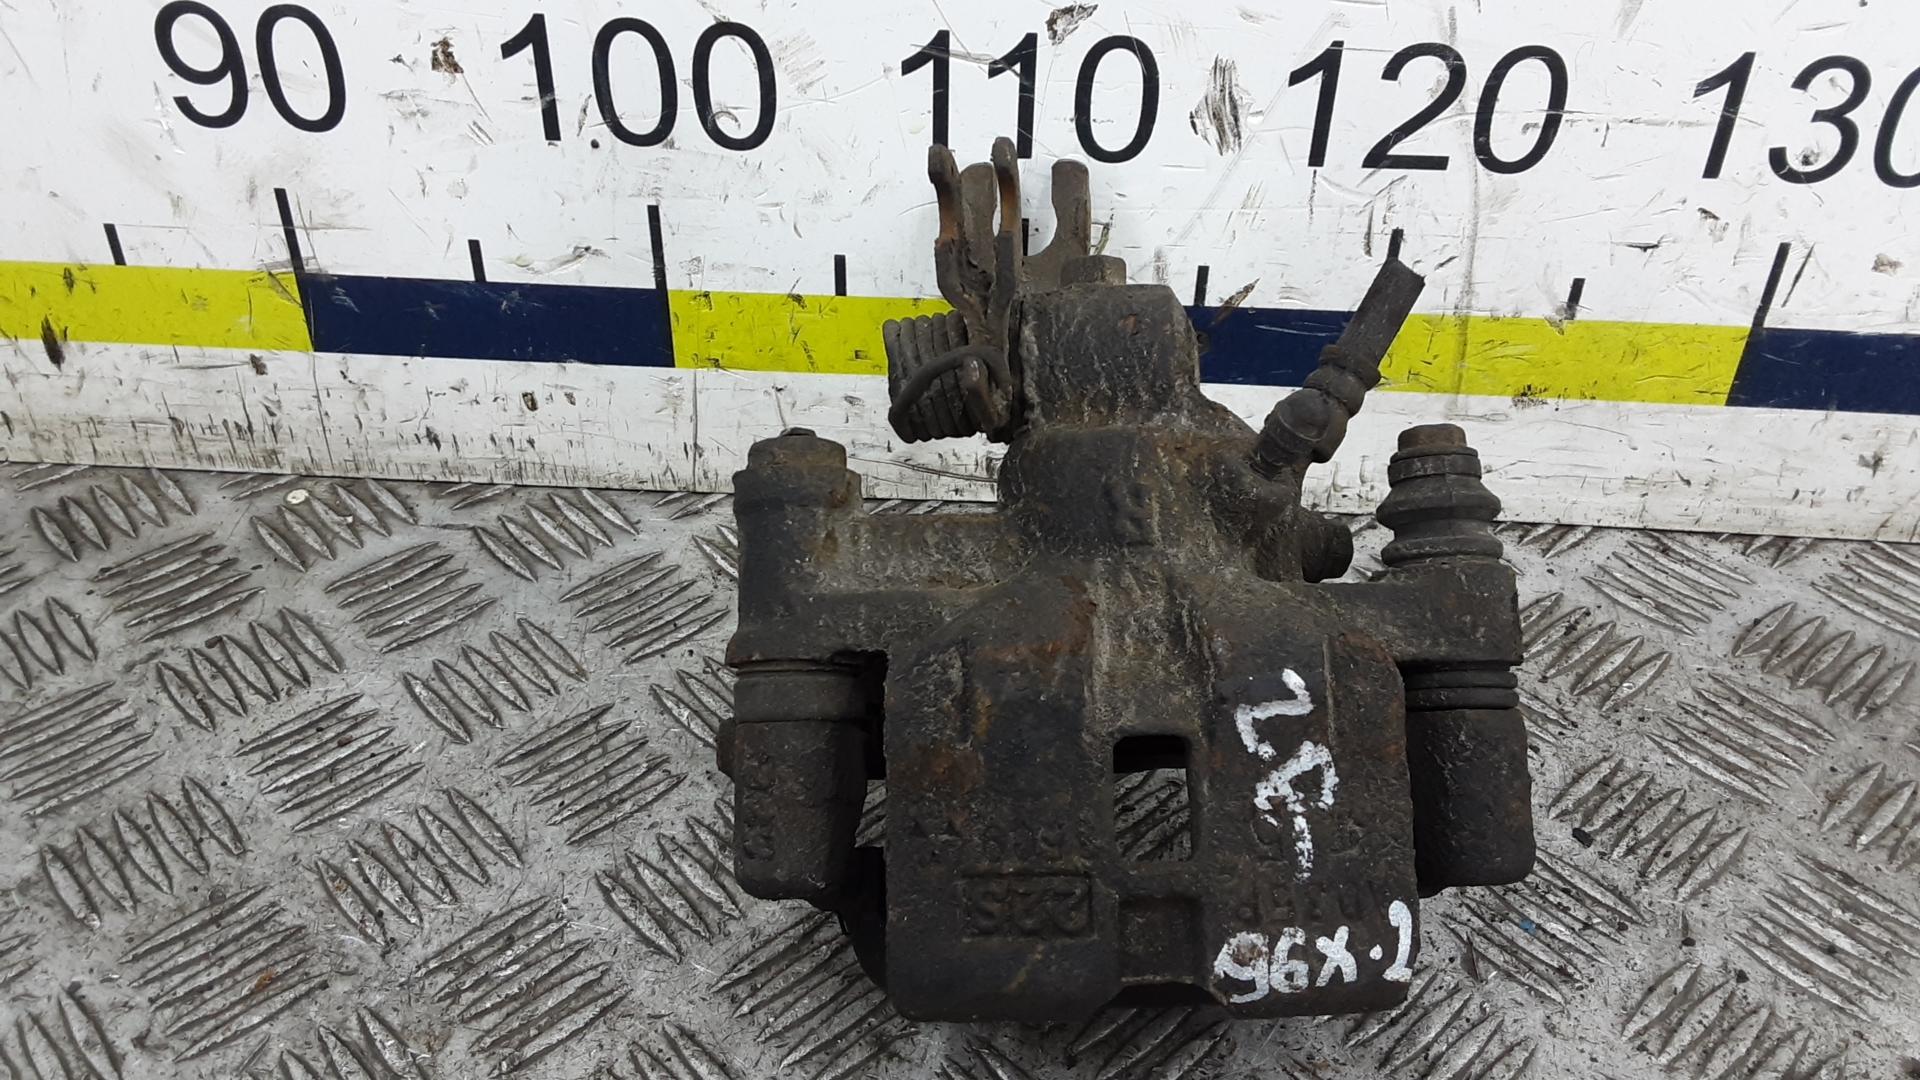 Суппорт тормозной задний правый, MAZDA, 323 BJ, 2000